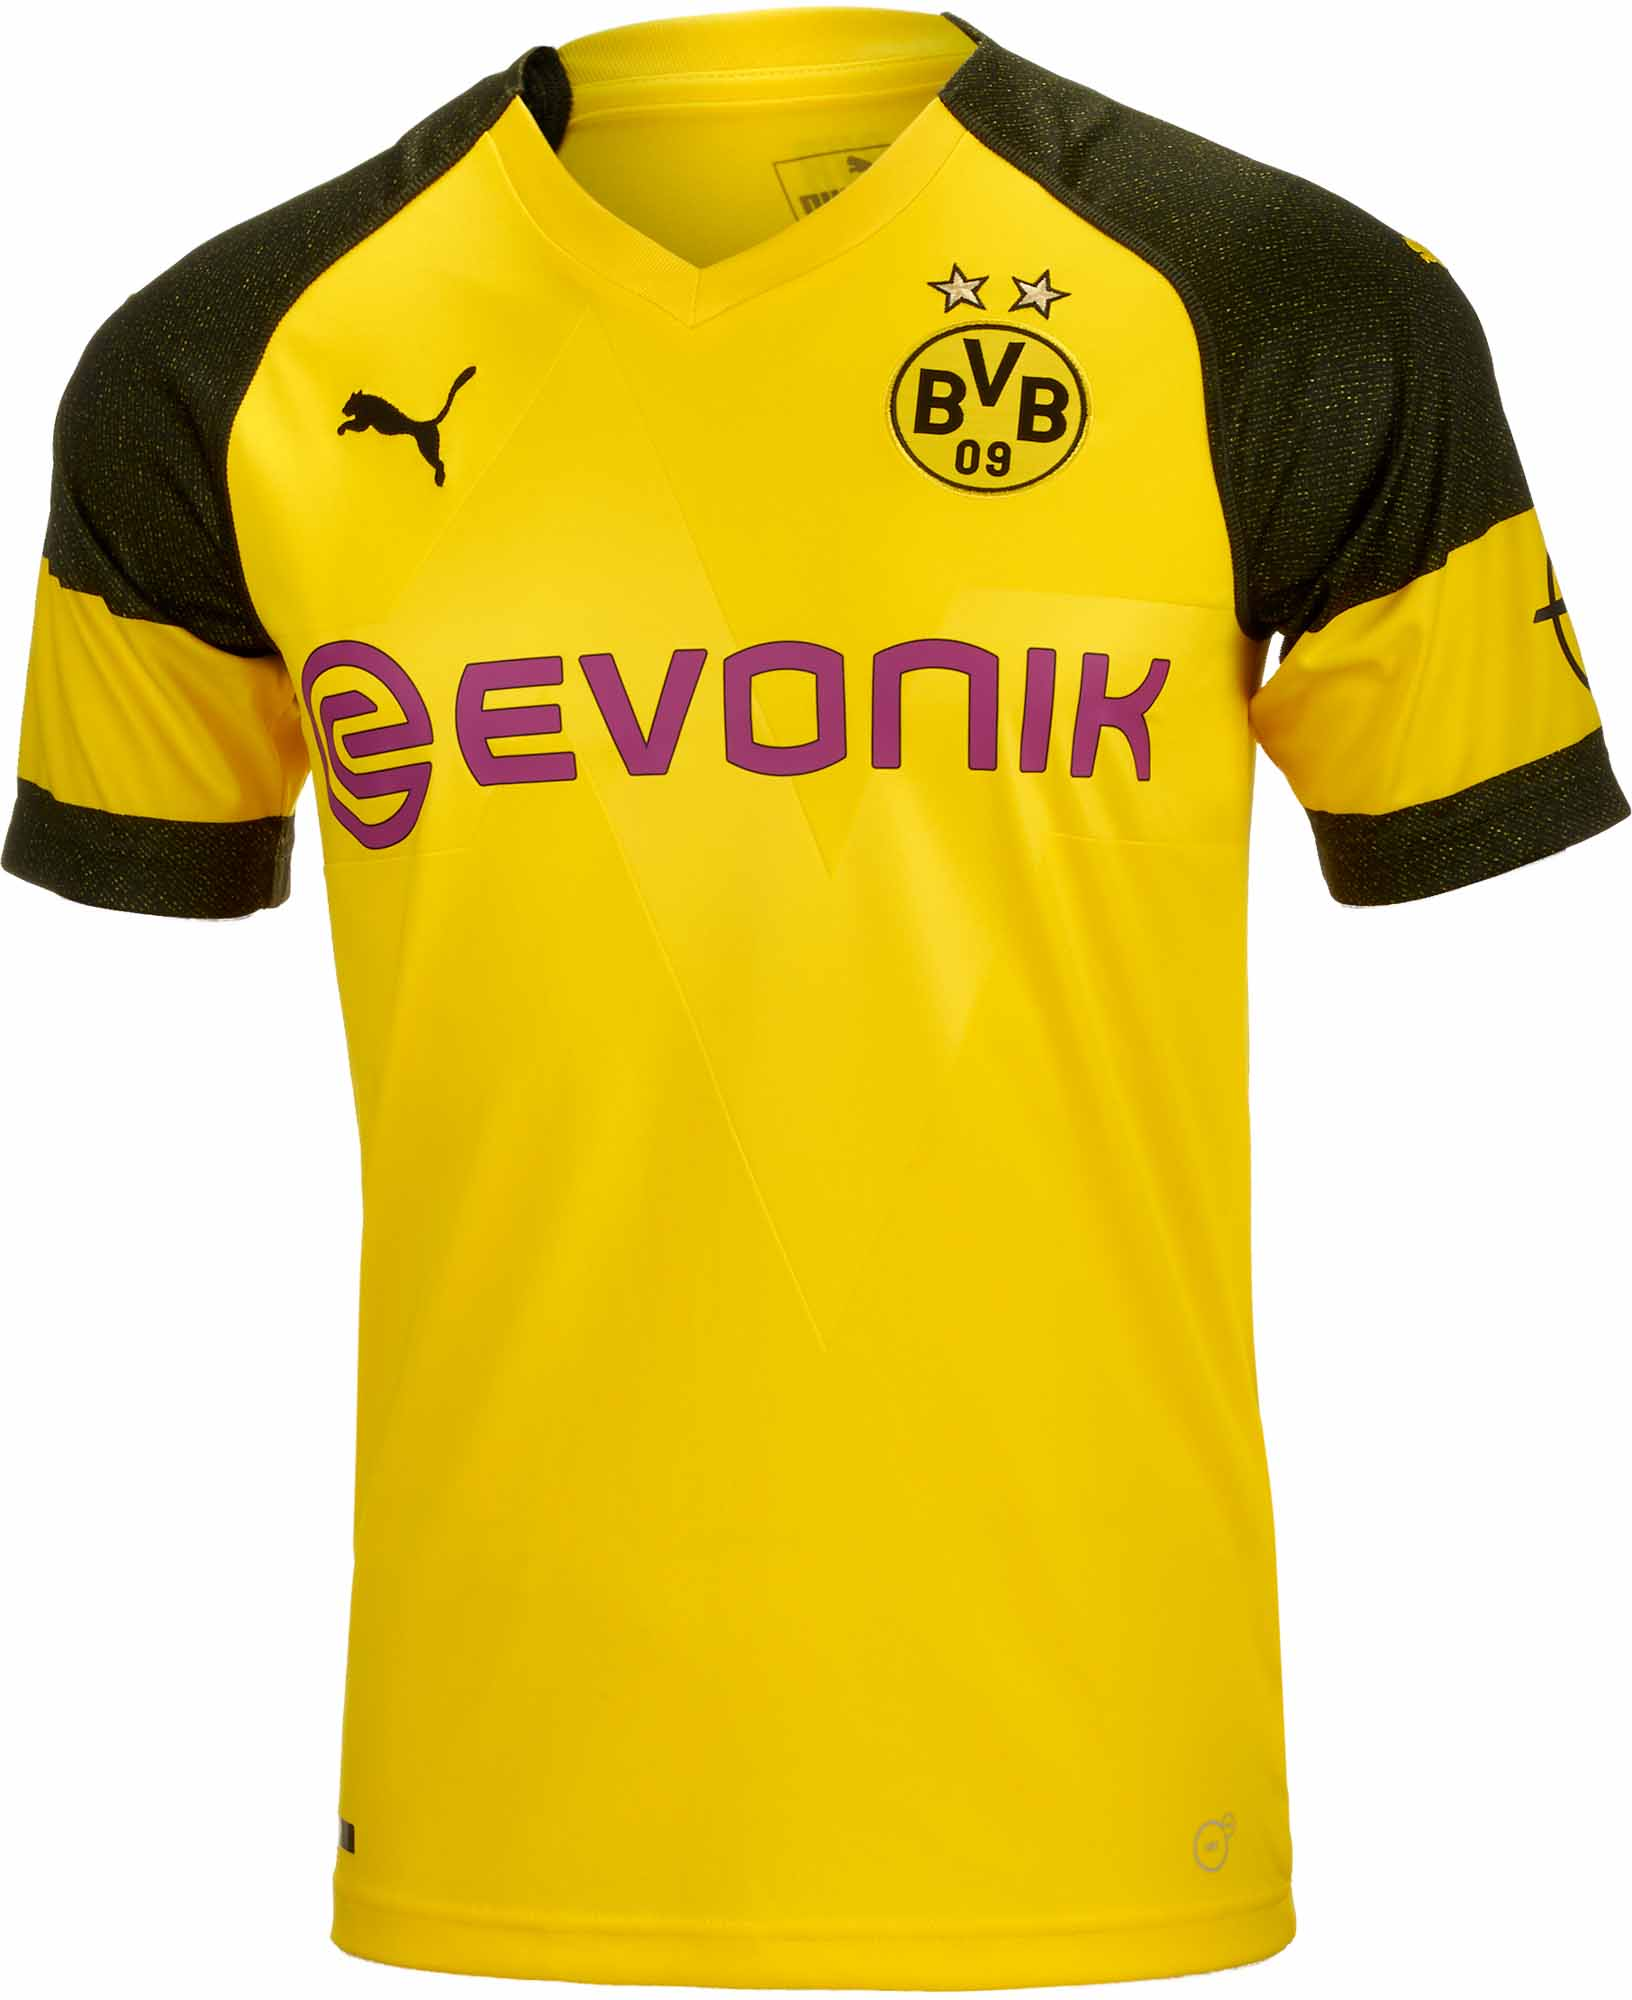 201819 PUMA Borussia Dortmund Home Jersey Cleatsxp